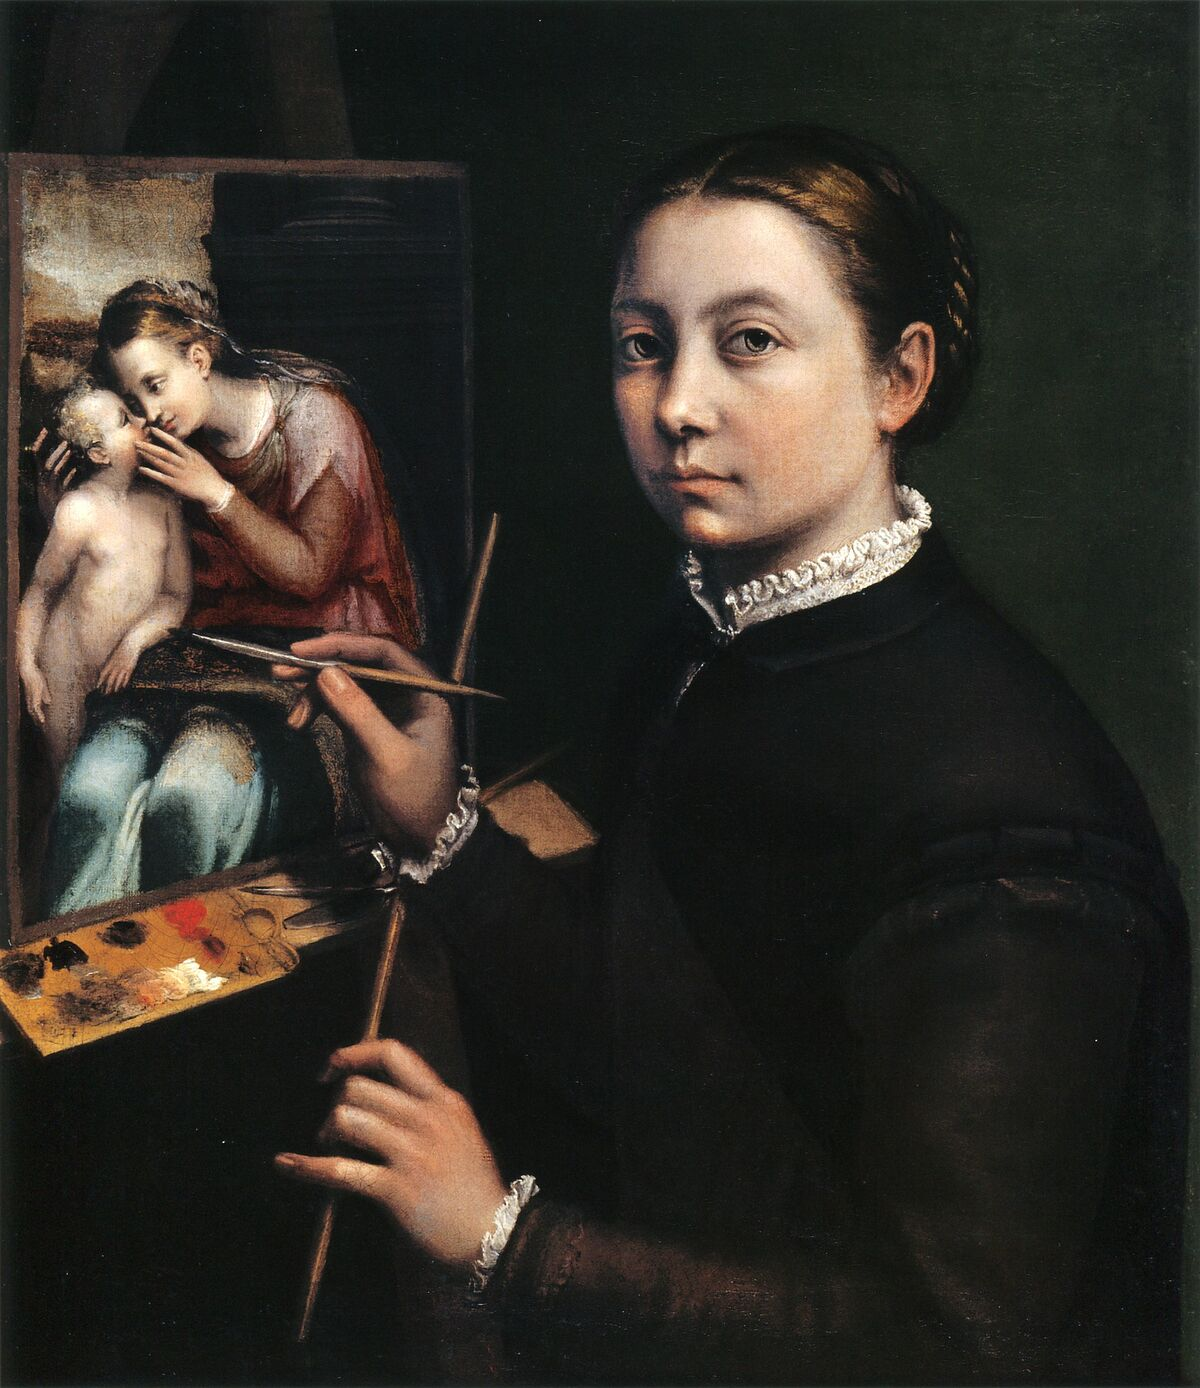 Sofonisba Anguissola, Self-portrait at the Easel Painting a Devotional Panel, 1556. Image via Wikimedia Commons.